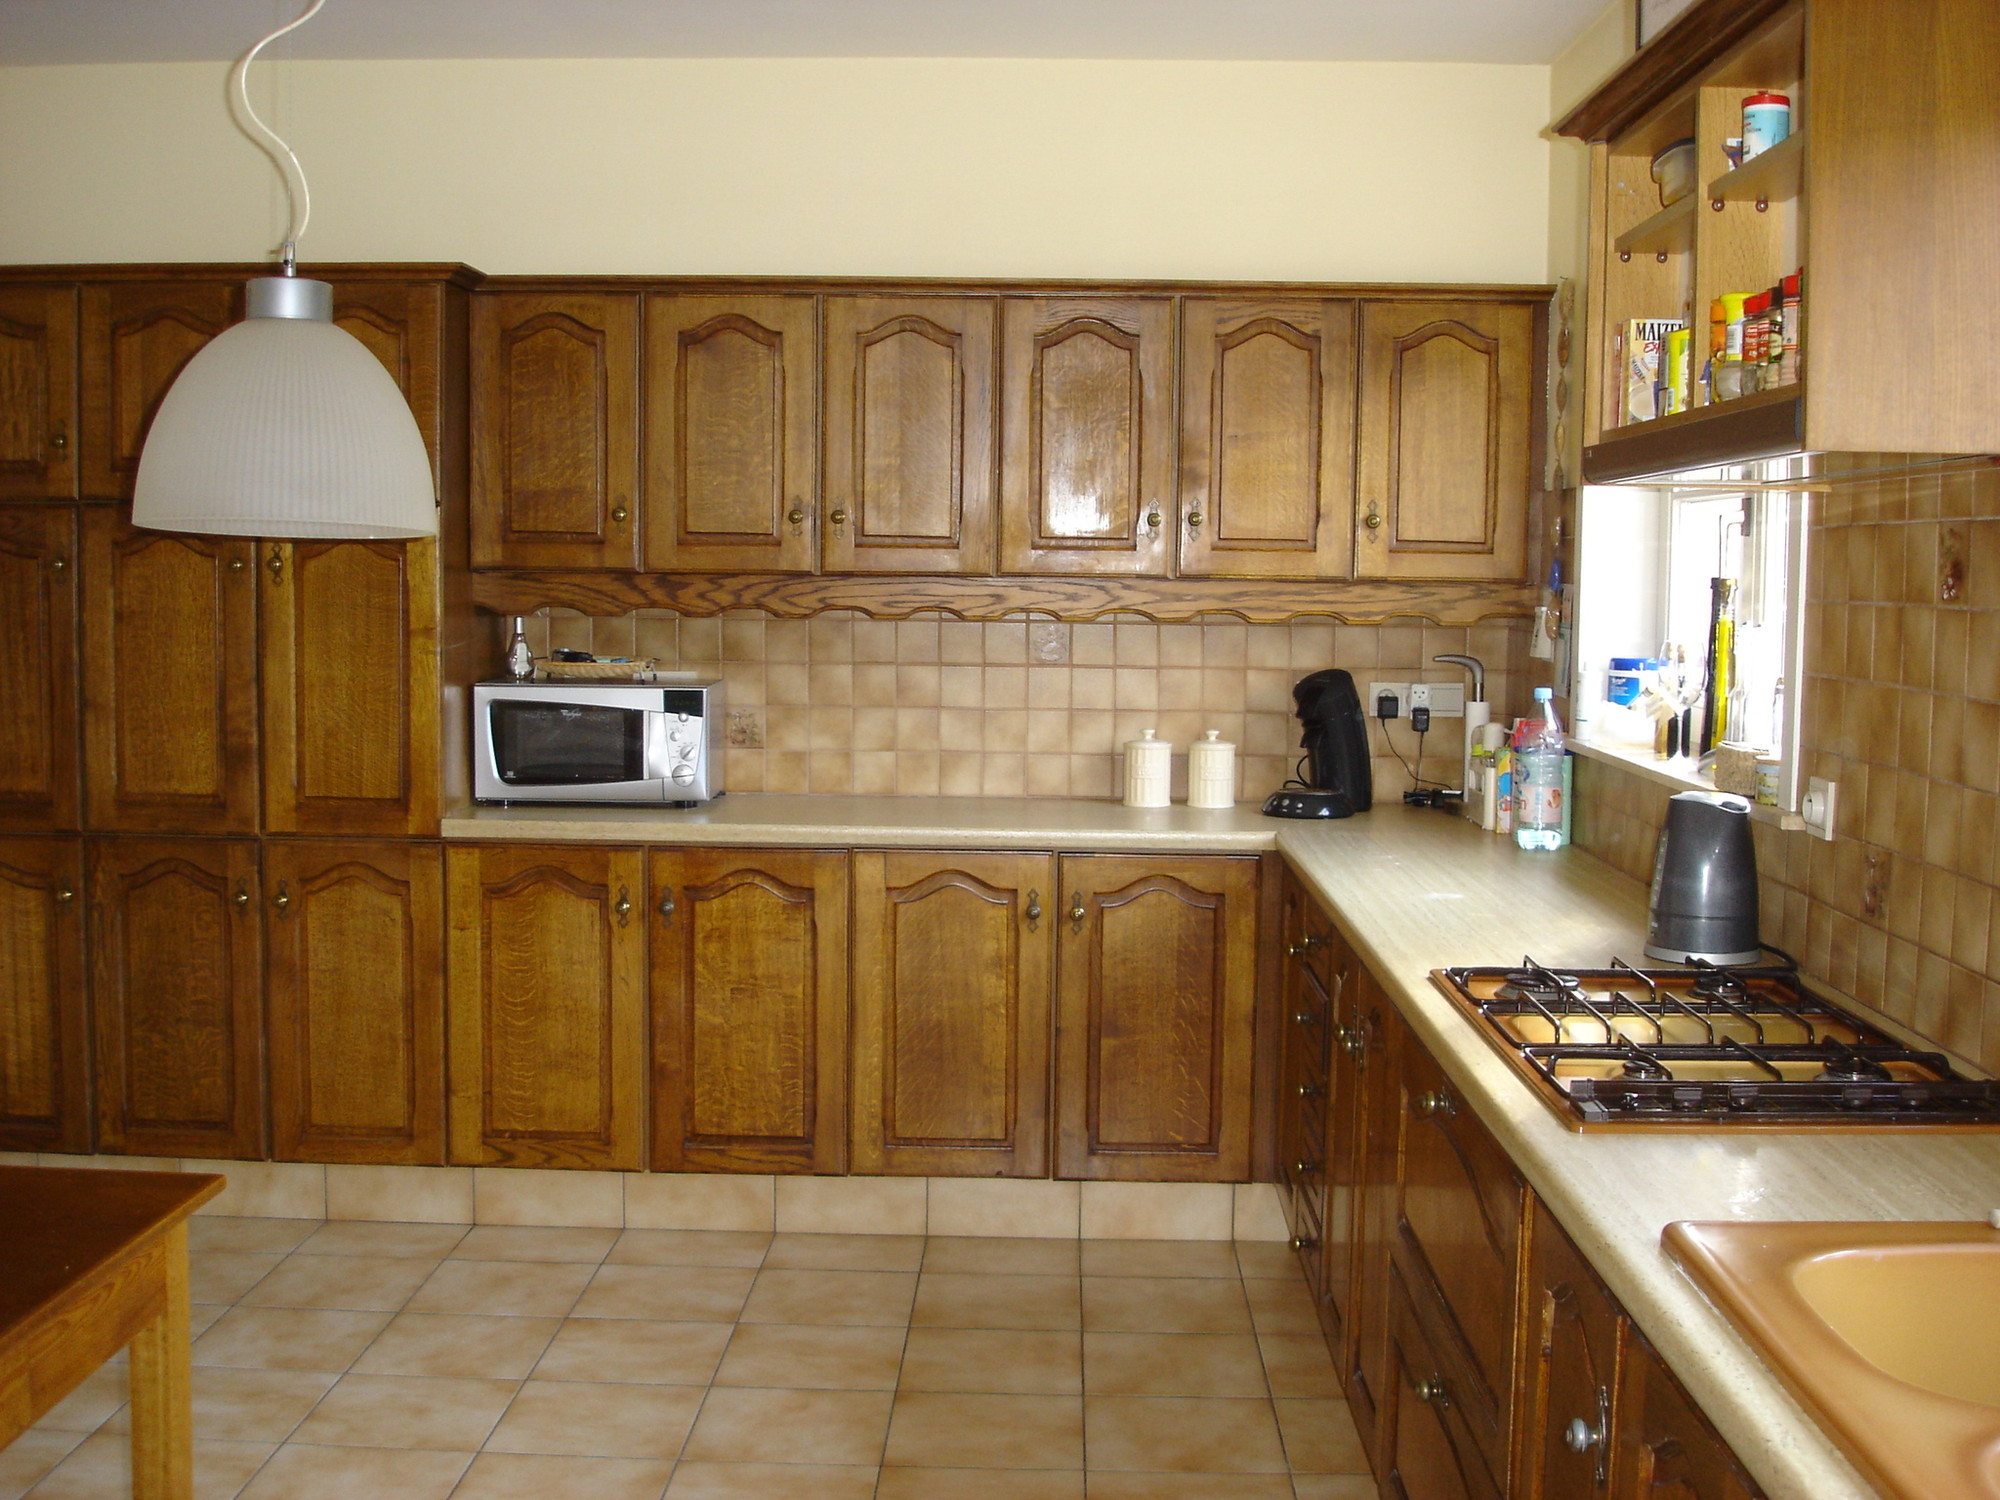 Blog eikenhouten keukenkasten schilderen colora.be